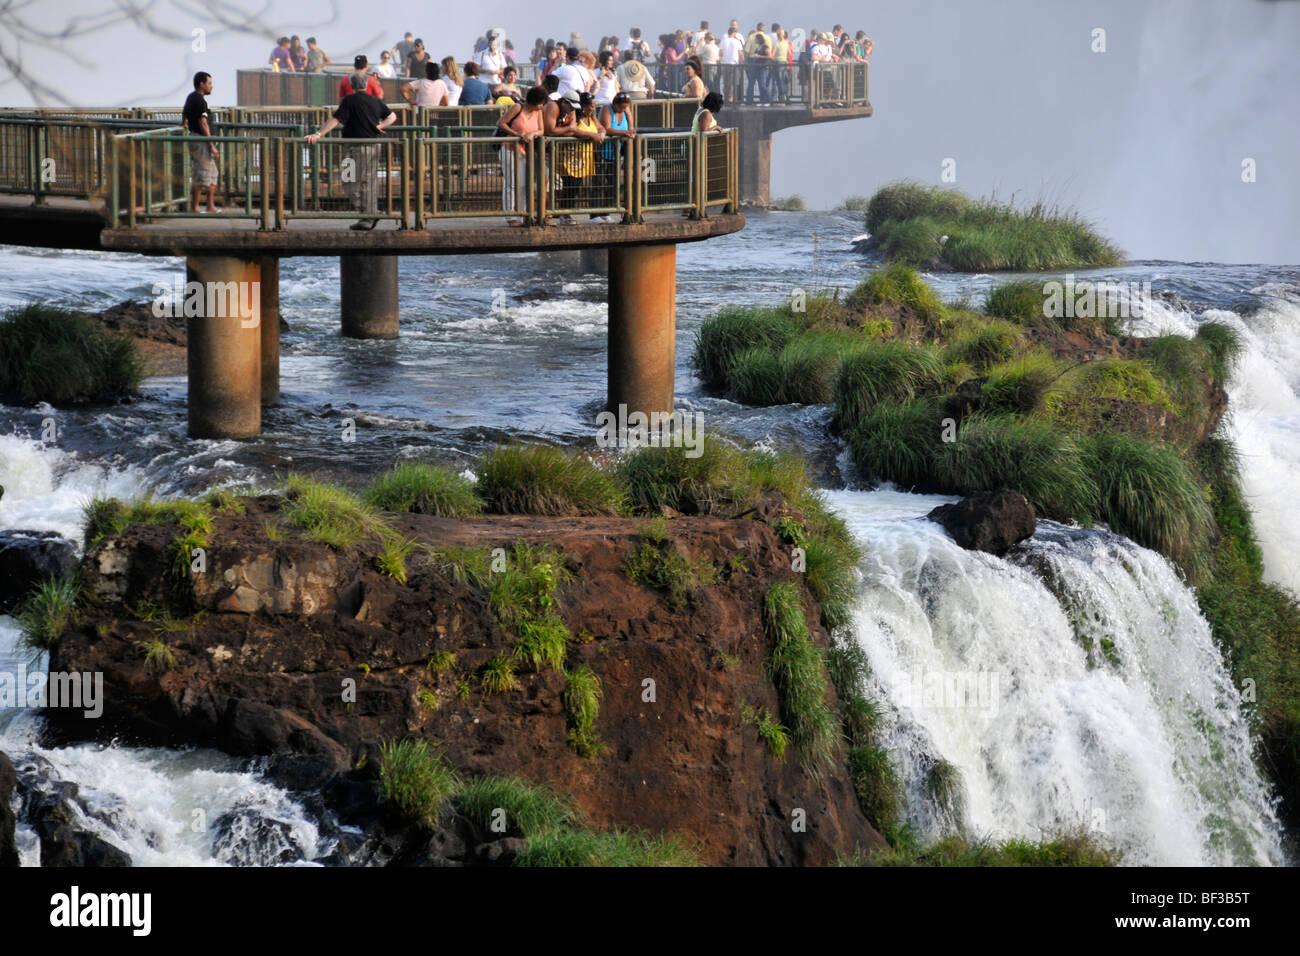 Iguazu Falls, Foz do Iguacu, Parana, Brazil - Stock Image